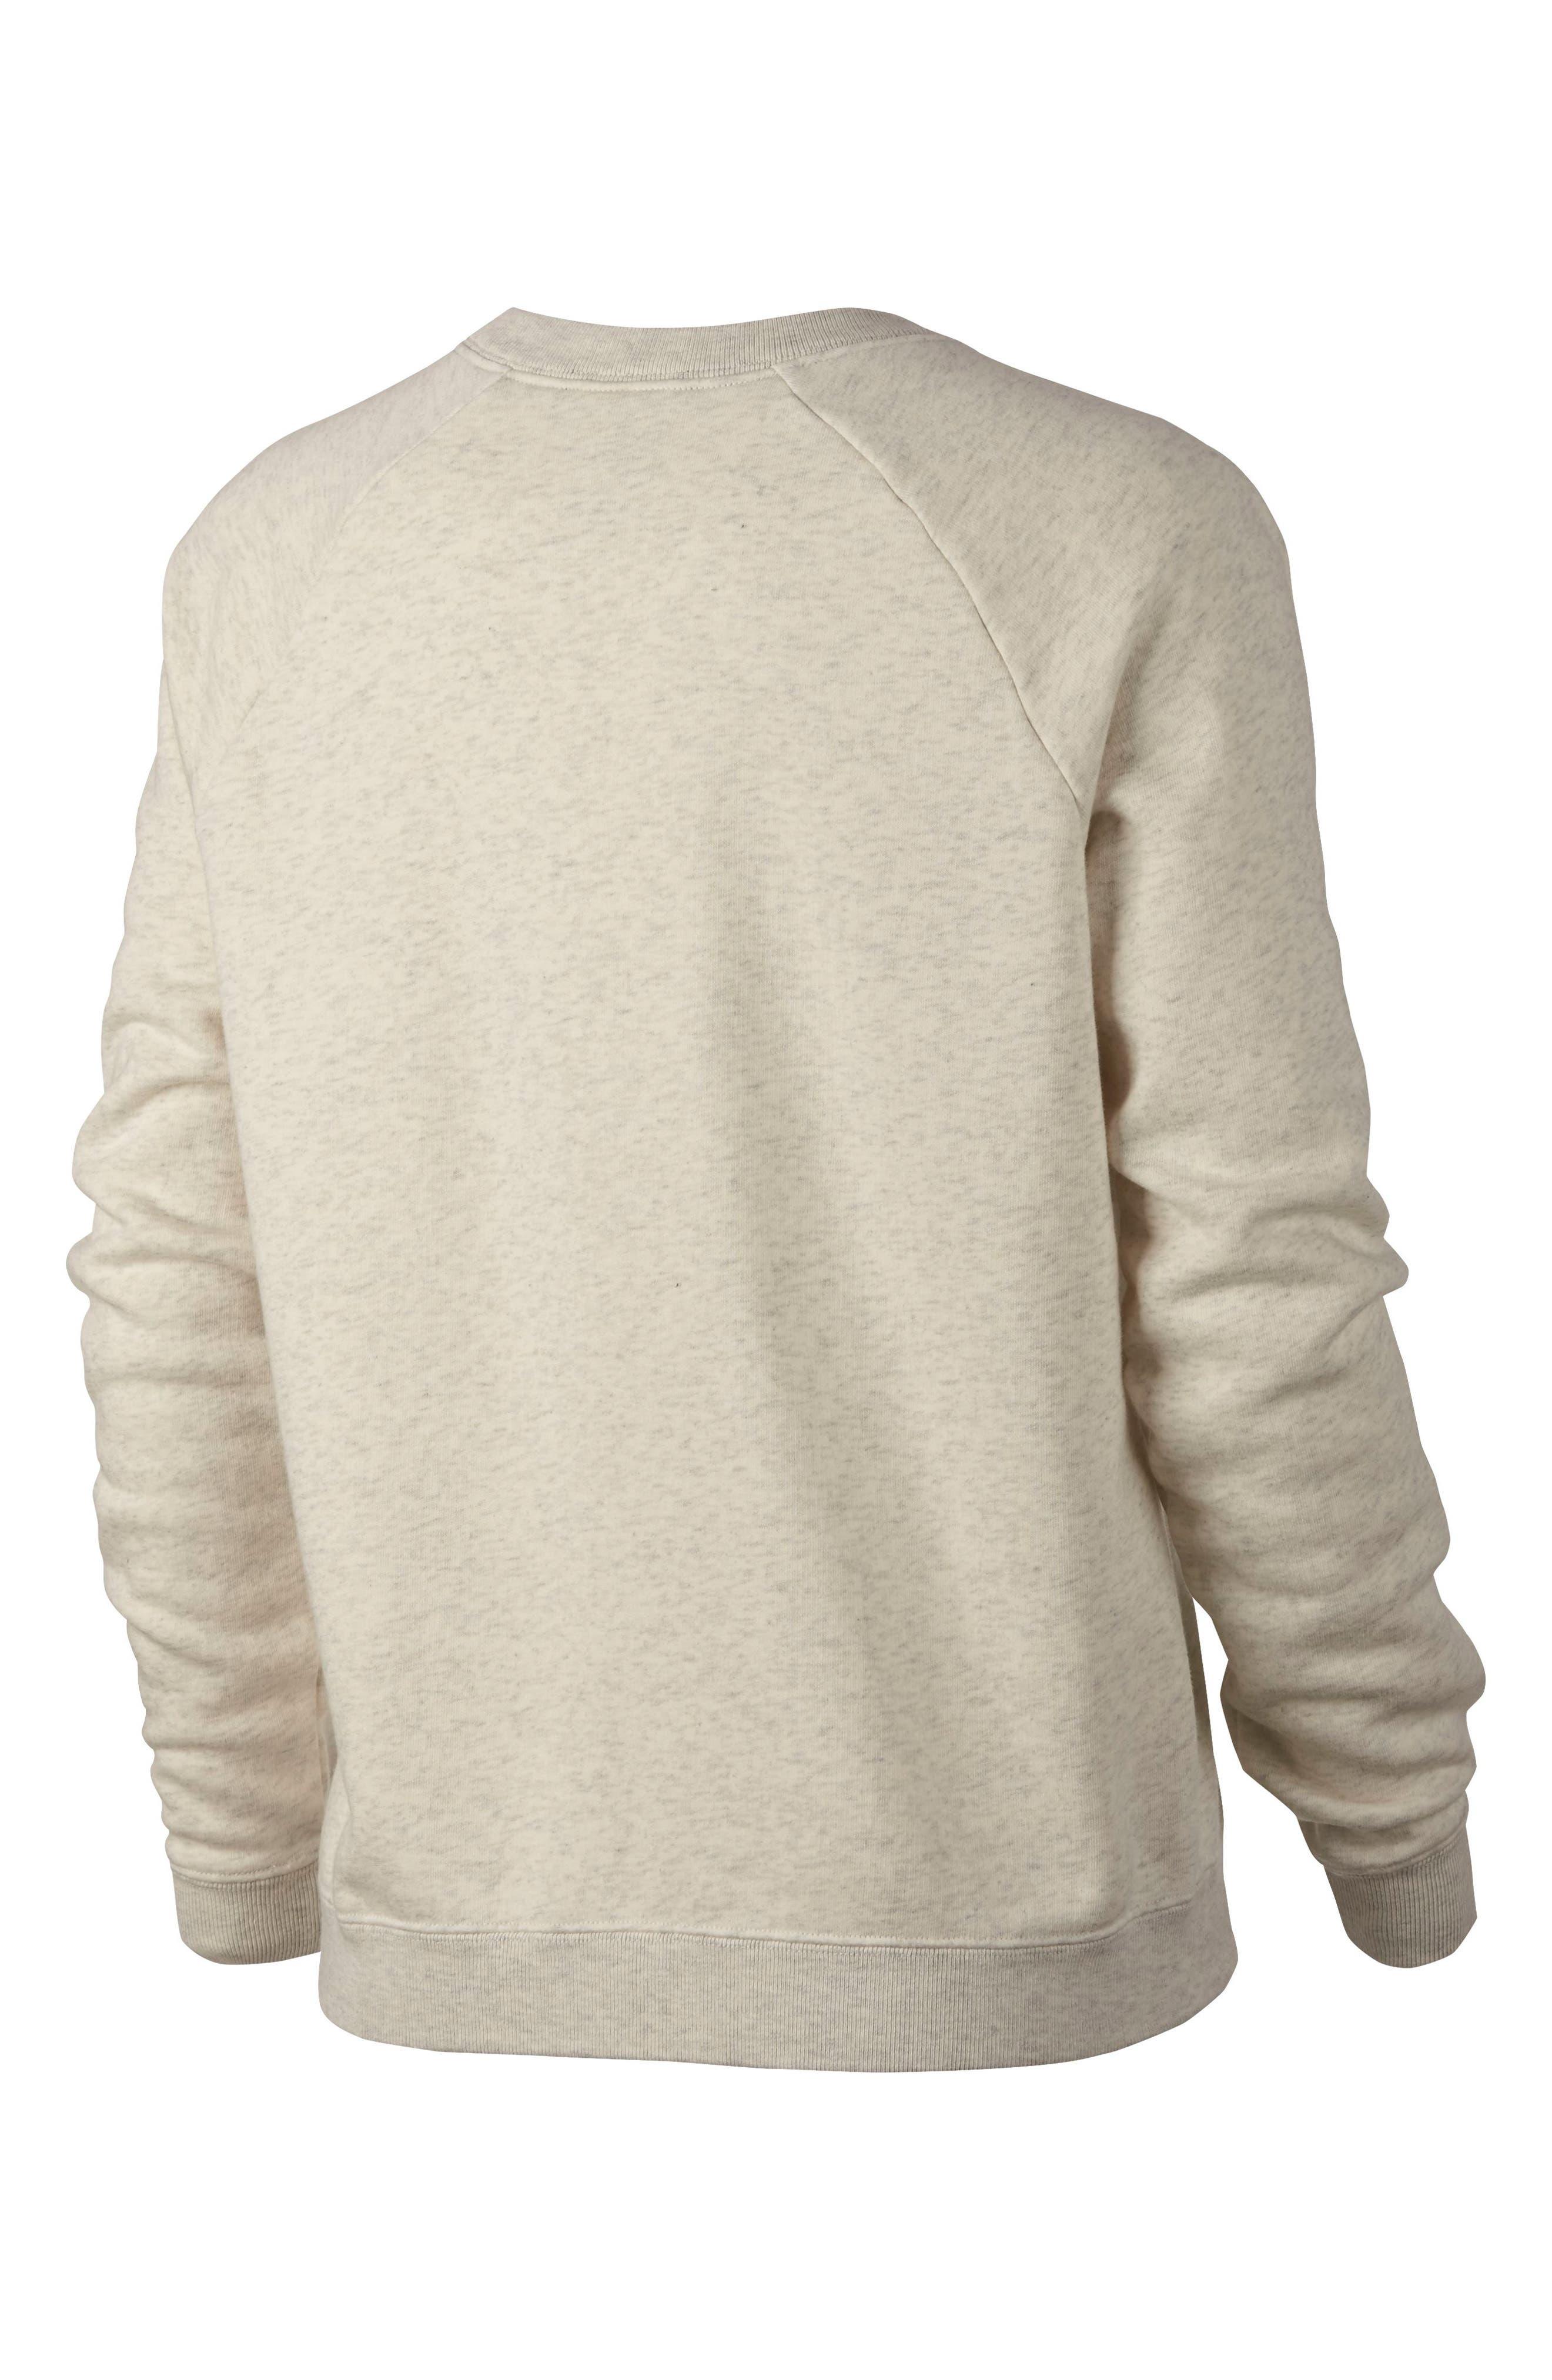 Sportswear Rally Sweatshirt,                             Alternate thumbnail 2, color,                             250